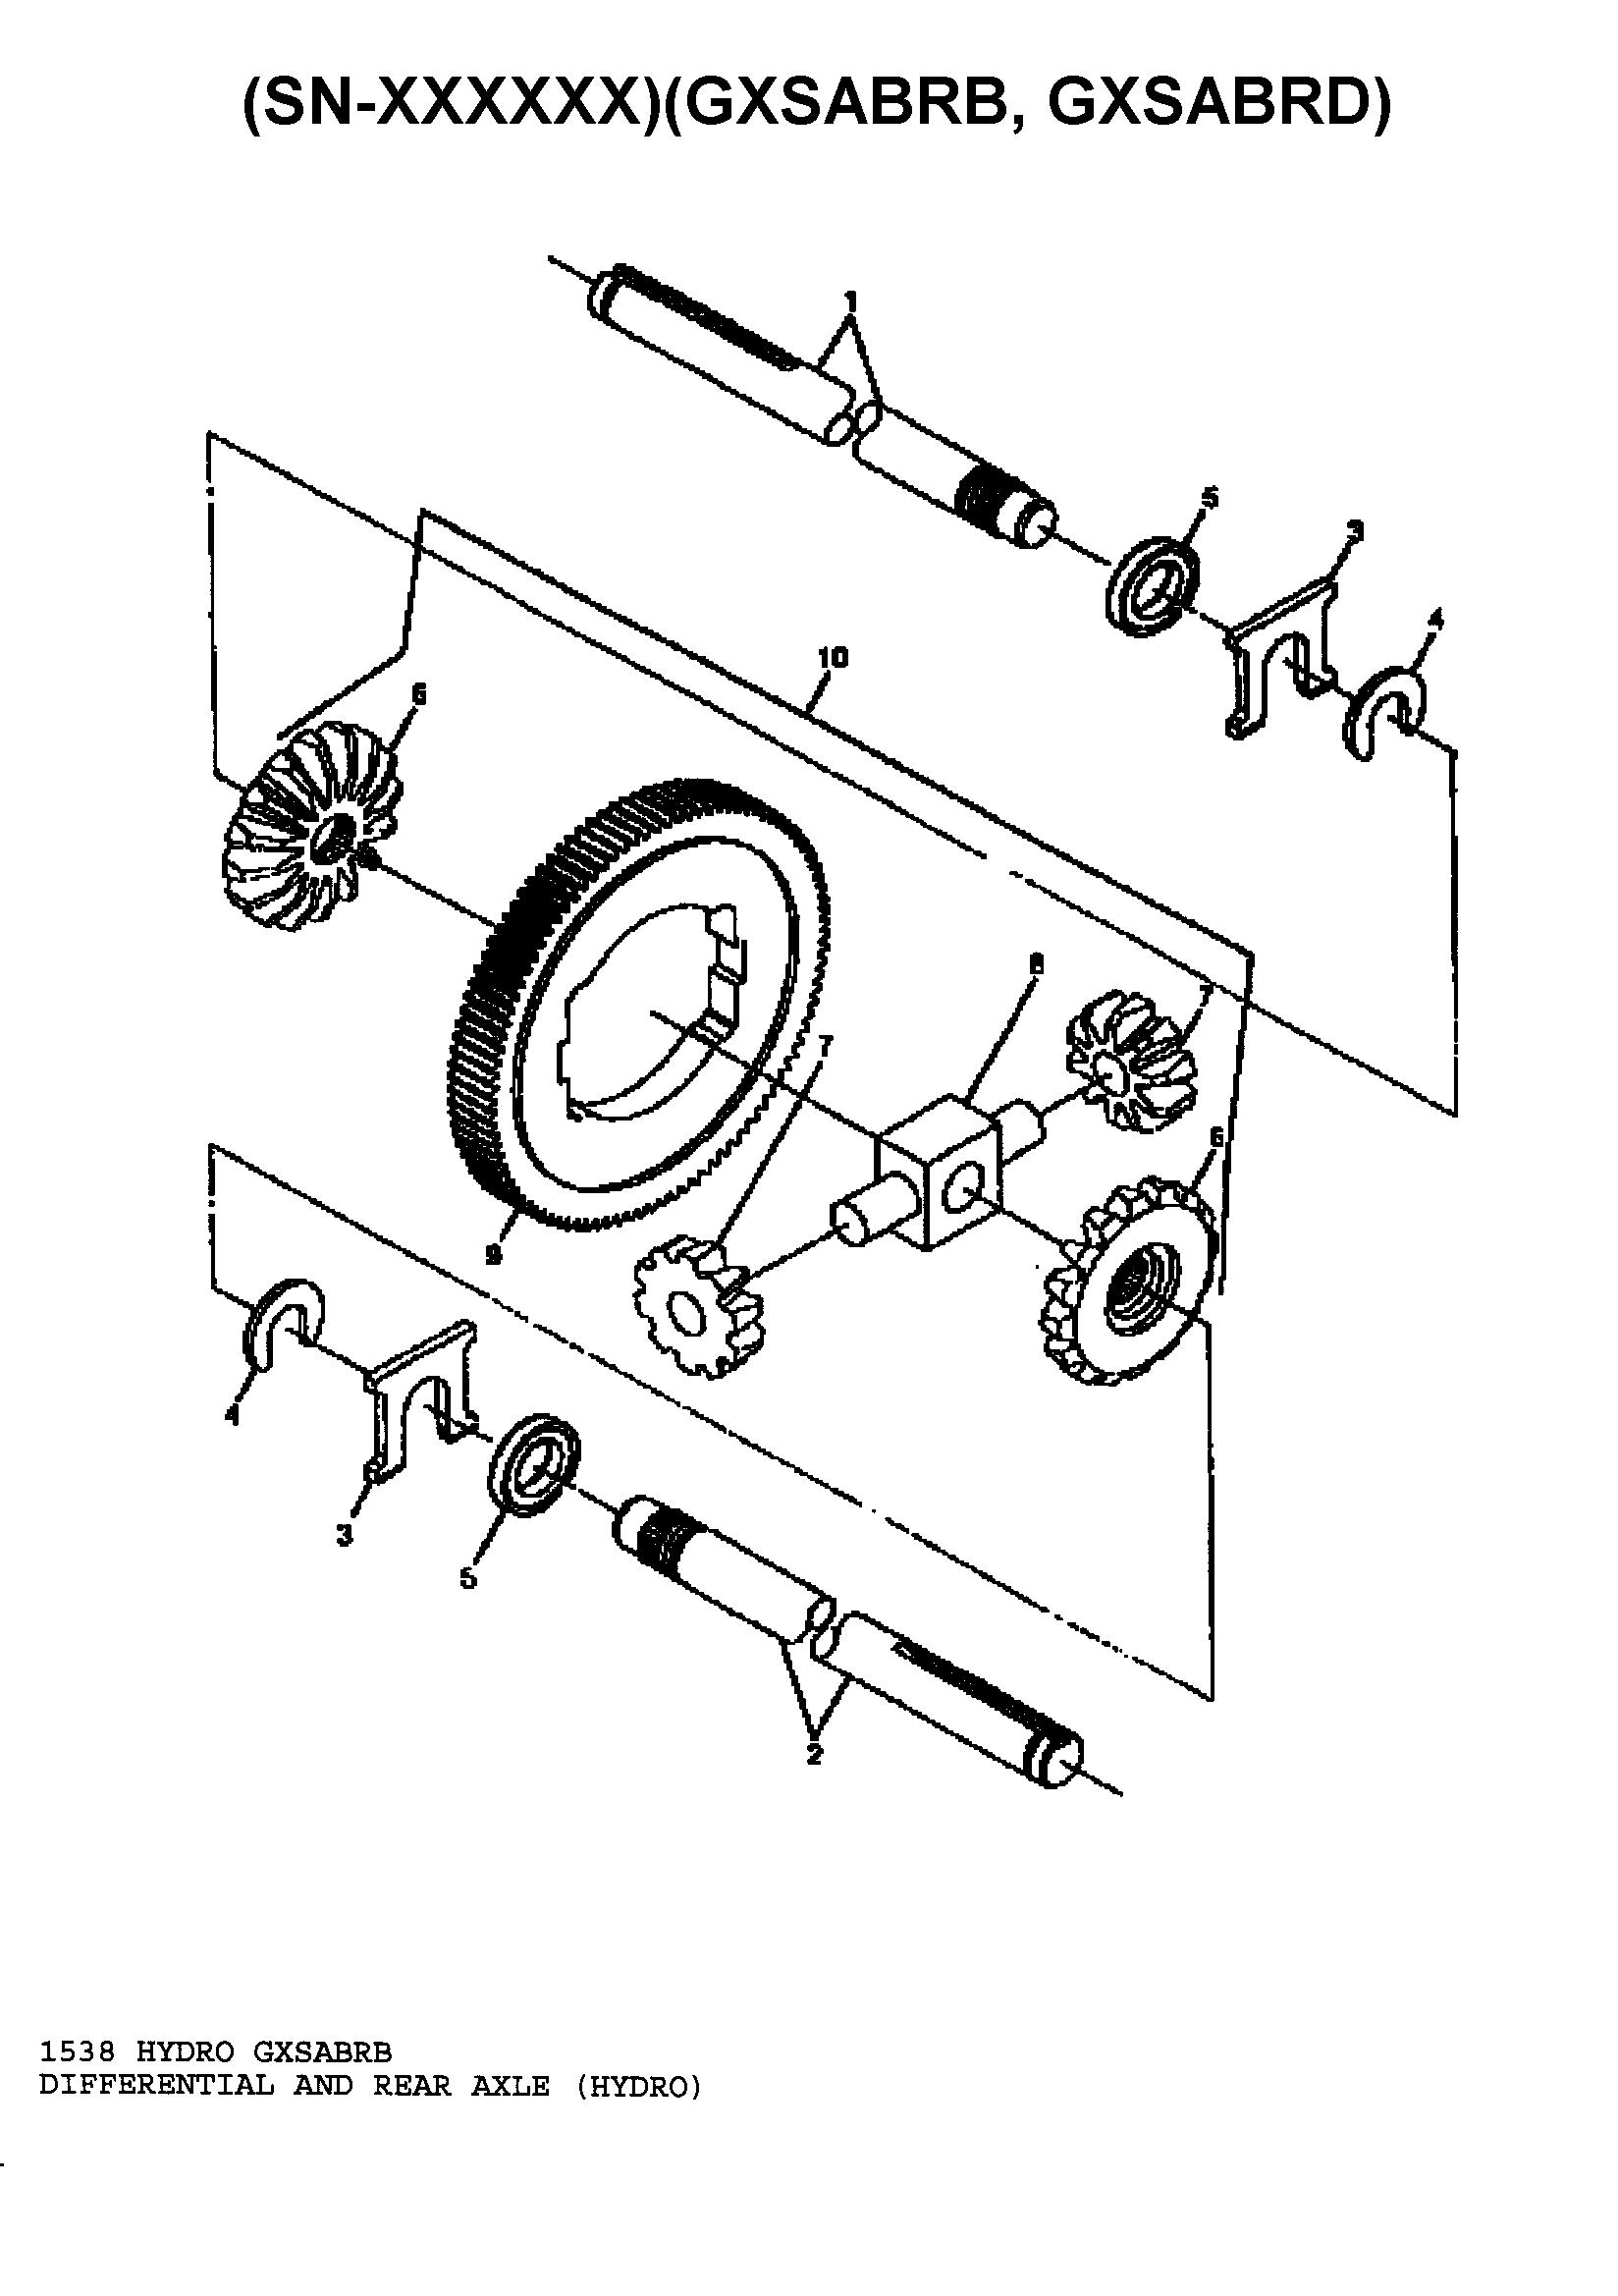 hight resolution of john deere sabre gear wiring diagram john deere sabre john deere 1338 sabre gear wiring diagram